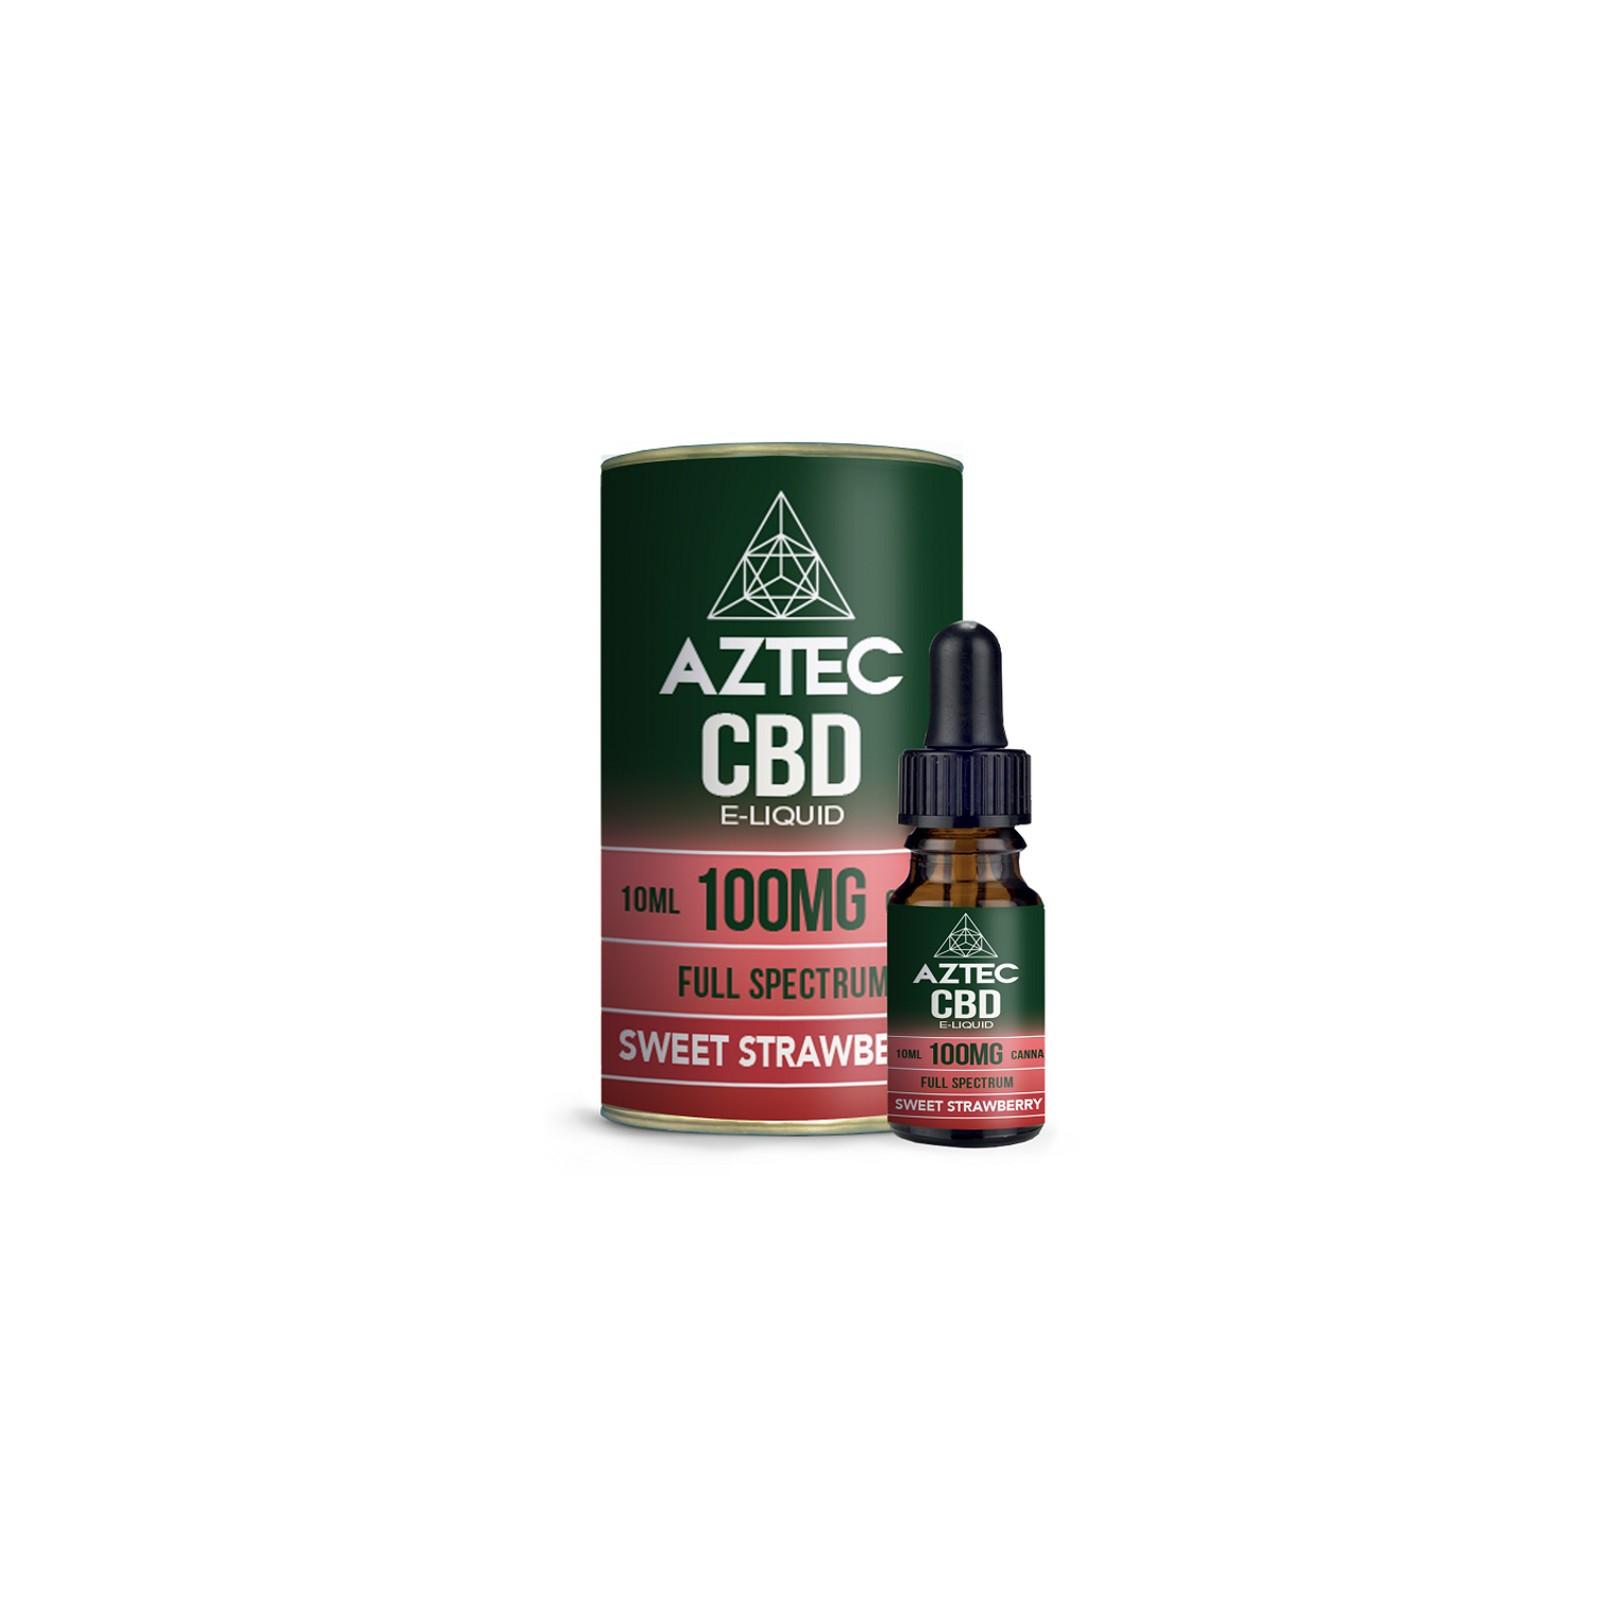 Sweet Strawberry Aztec CBD Full Spectrum